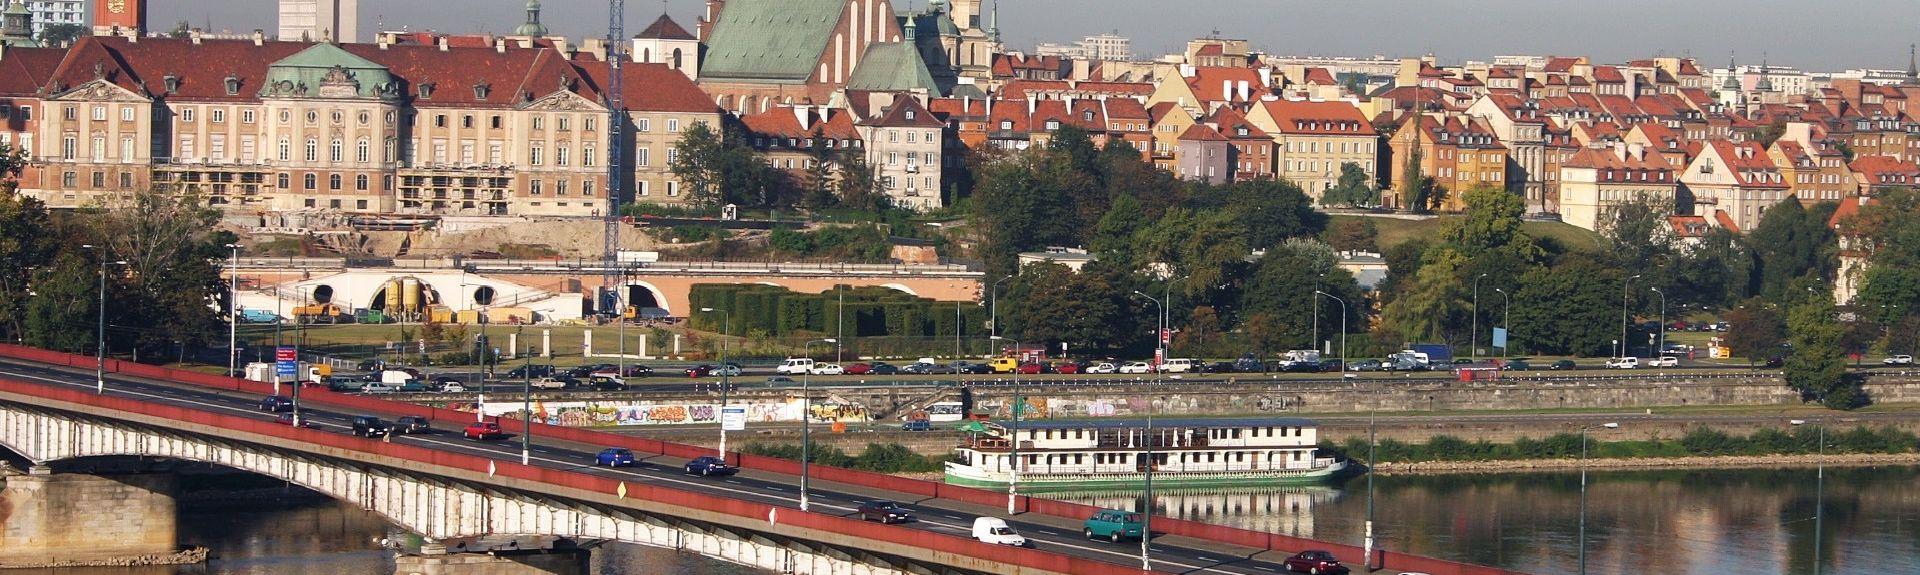 Bemowo, Warsaw, Poland